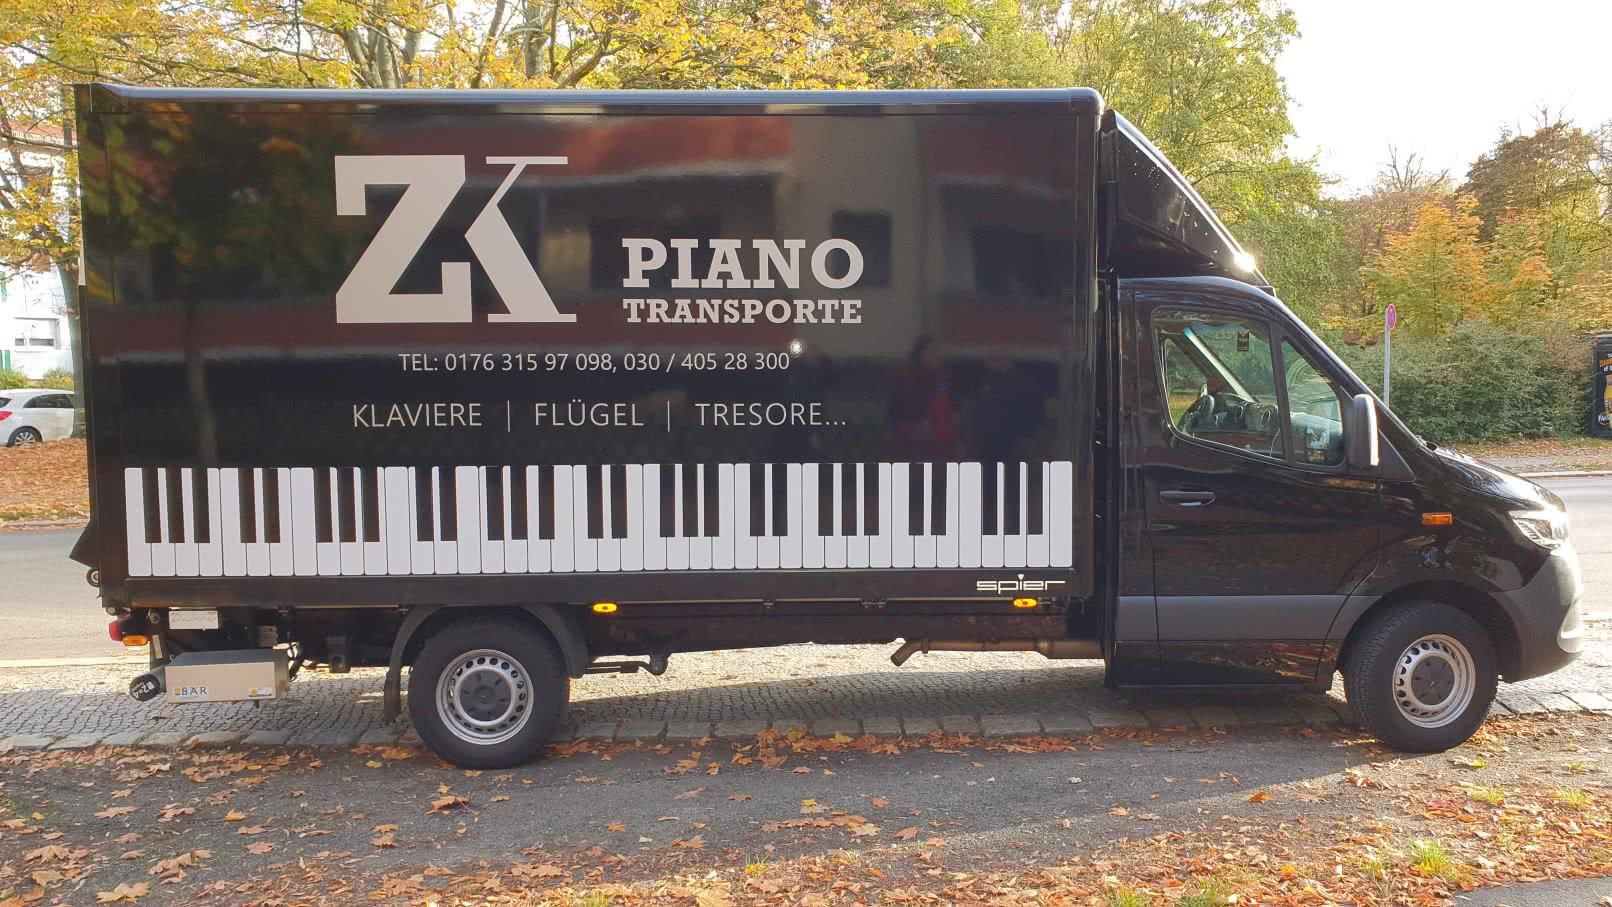 Klaviertransport Berlin - Spedition ZK Piano Transporte - Klaviertransporte, Flügeltransporte, Tresortransporte, Motorradtransporte in Berlin & Umgebung